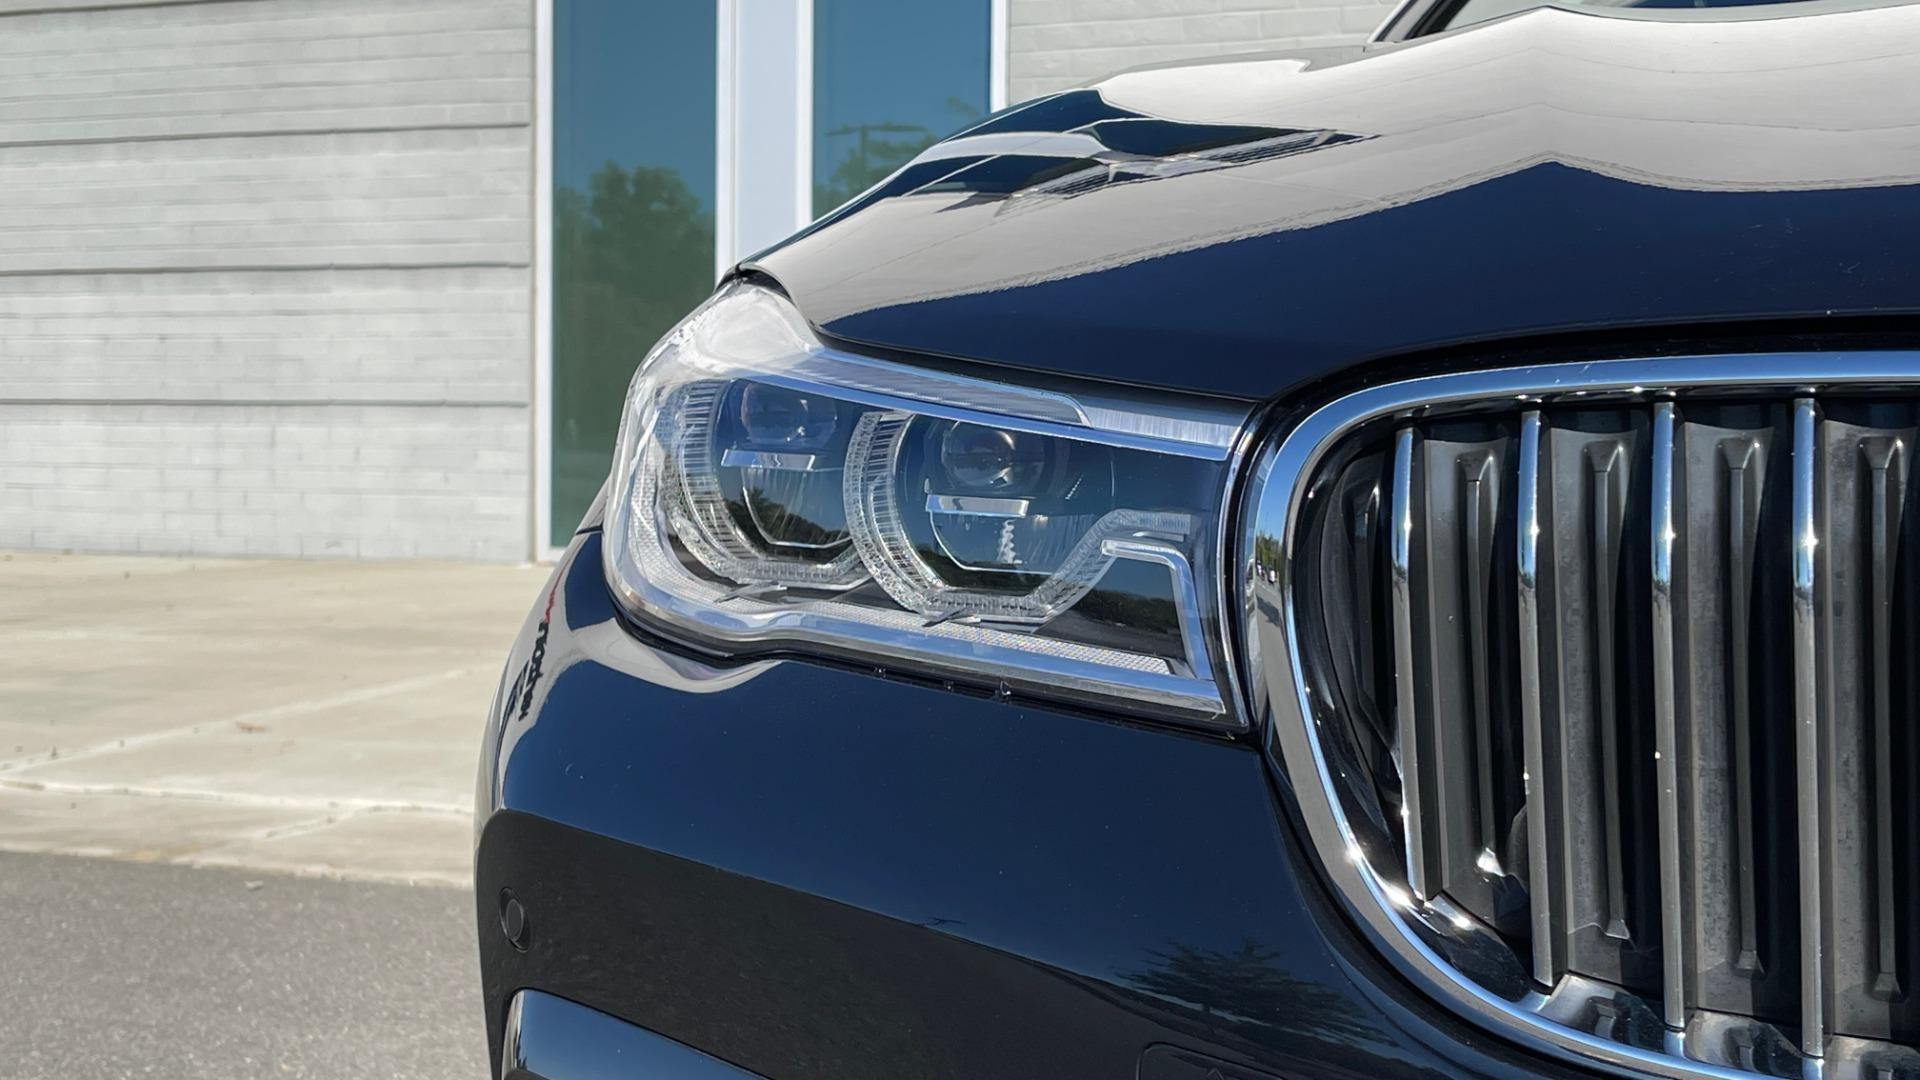 Used 2019 BMW 7 SERIES 750I XDRIVE M-SPORT / EXEC PKG / DRVR ASST PLUS / CLD WTHR / PAR for sale $60,995 at Formula Imports in Charlotte NC 28227 12